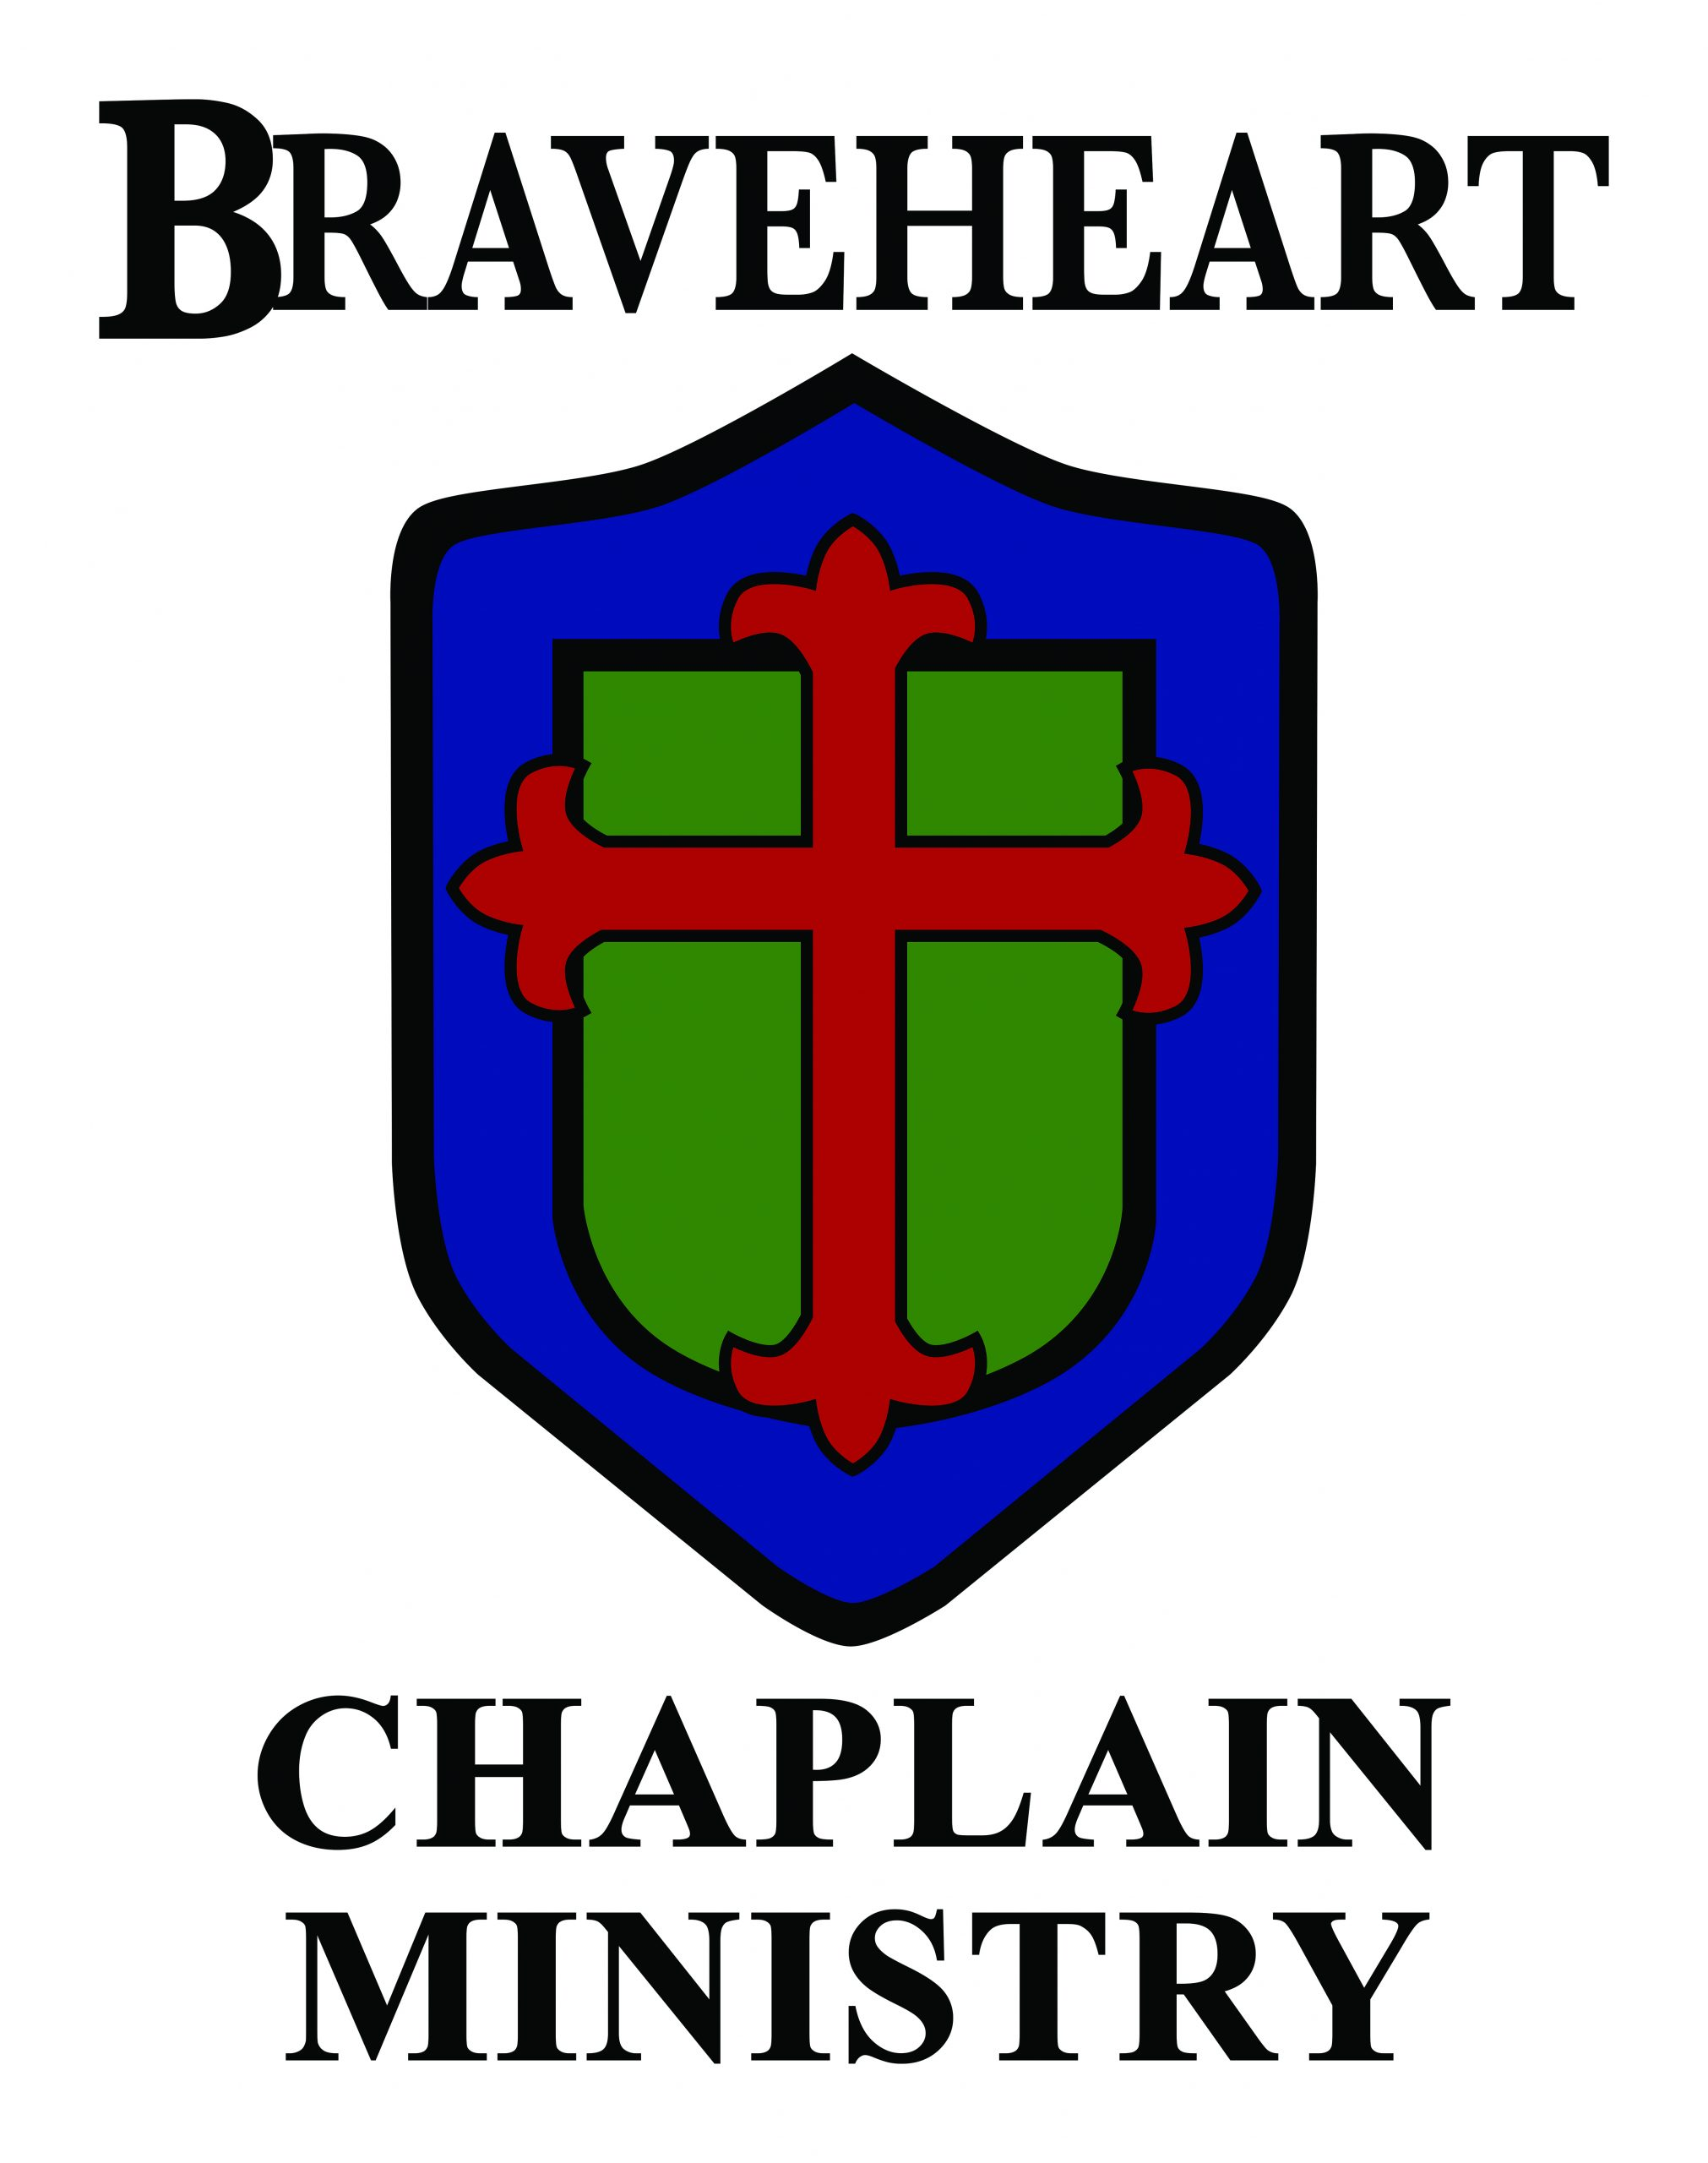 Braveheart Chaplian Ministry